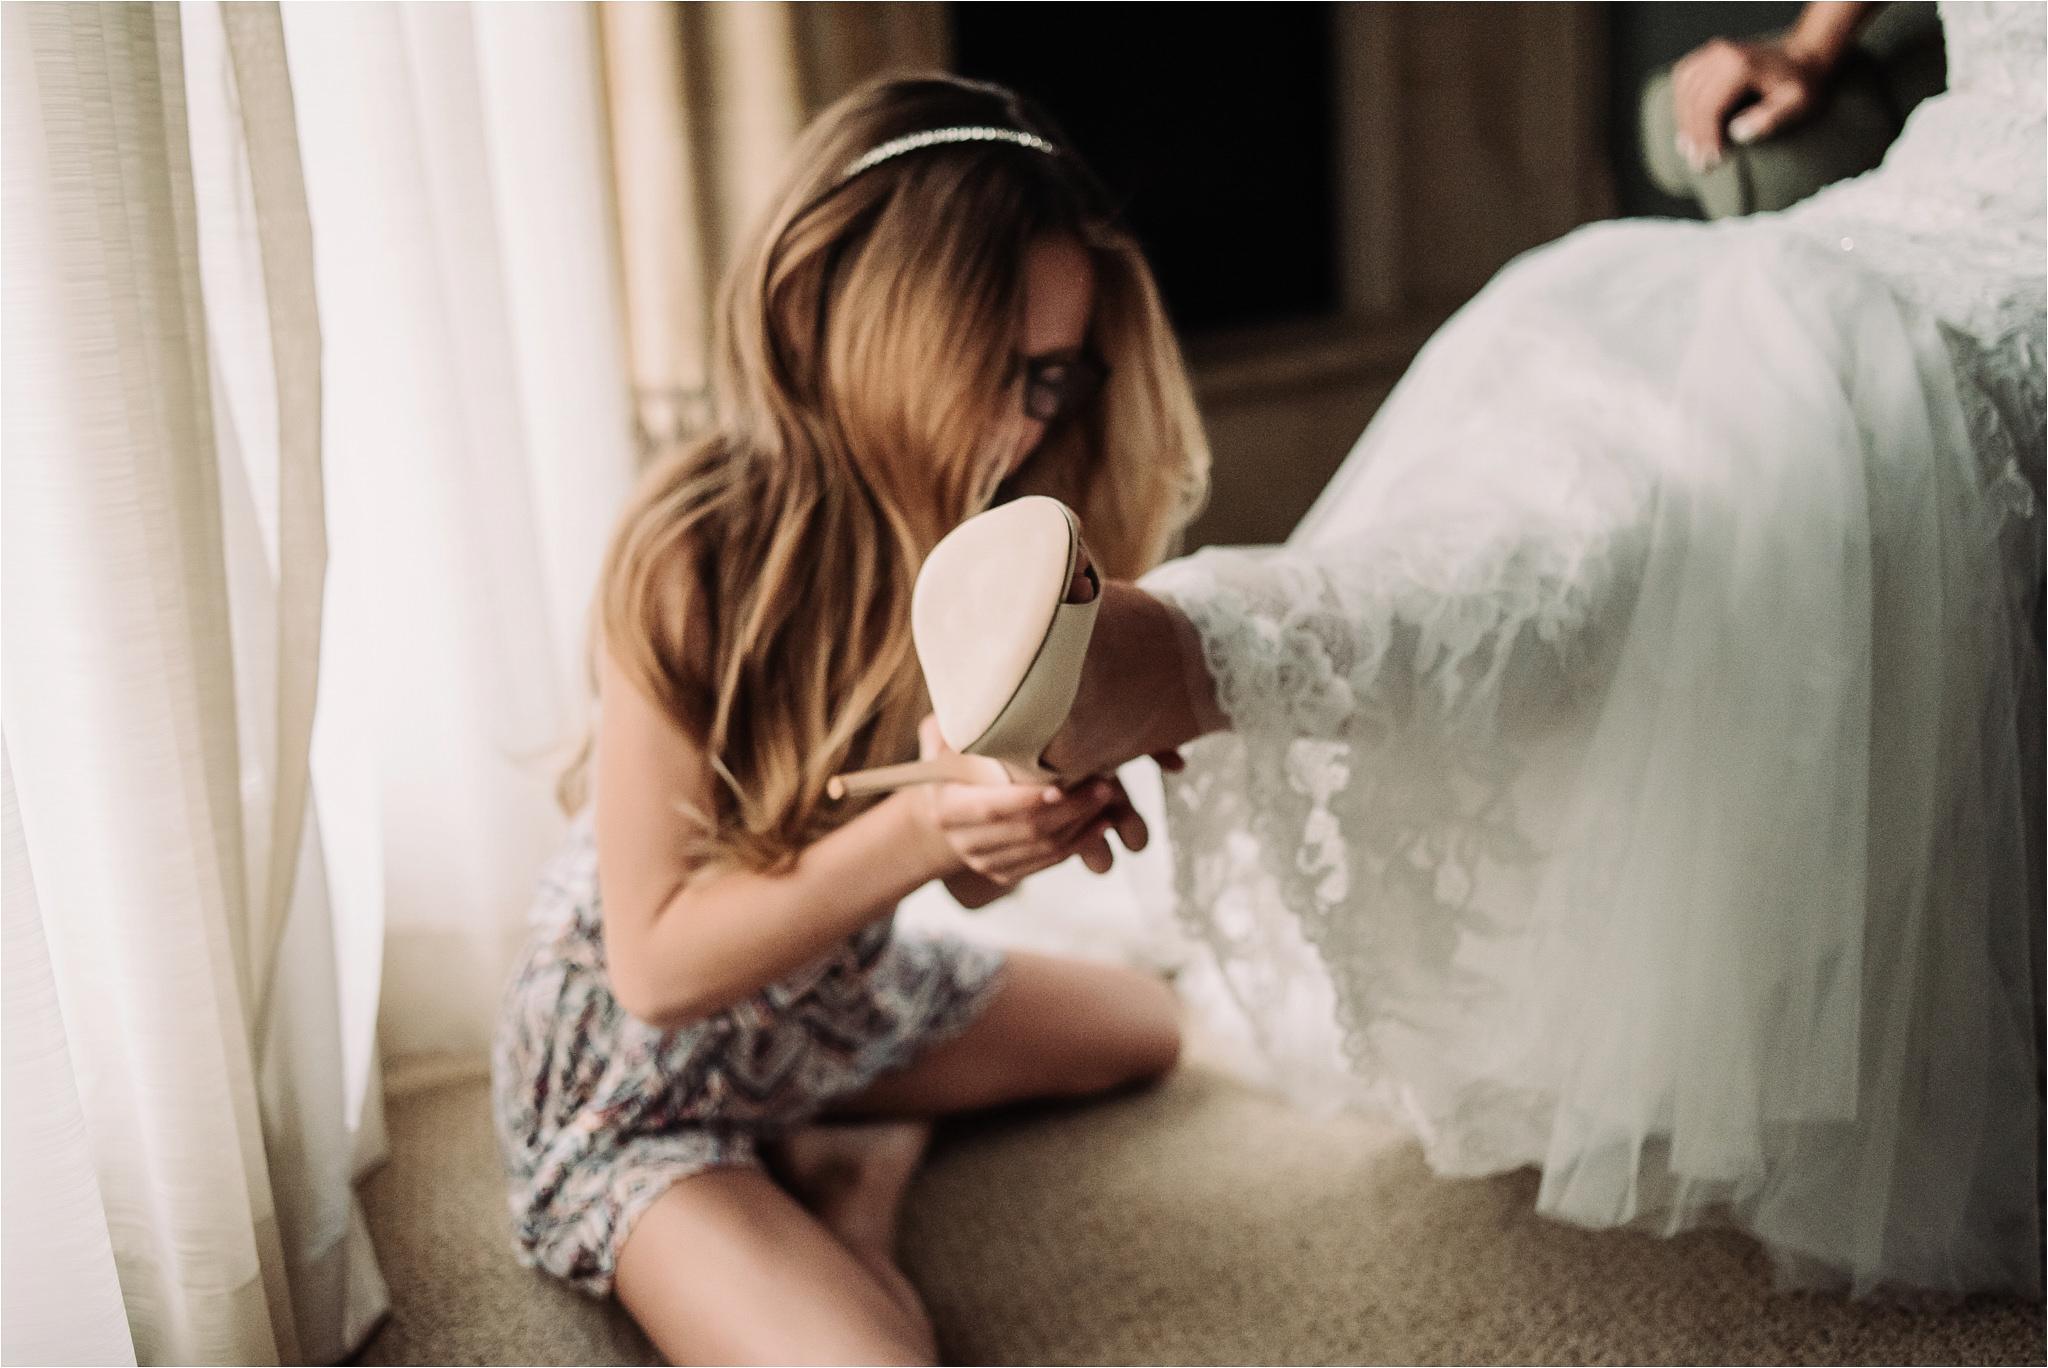 jessica-roman-photography-arden hills wedding photograpger-sacramento-boise-4.jpg